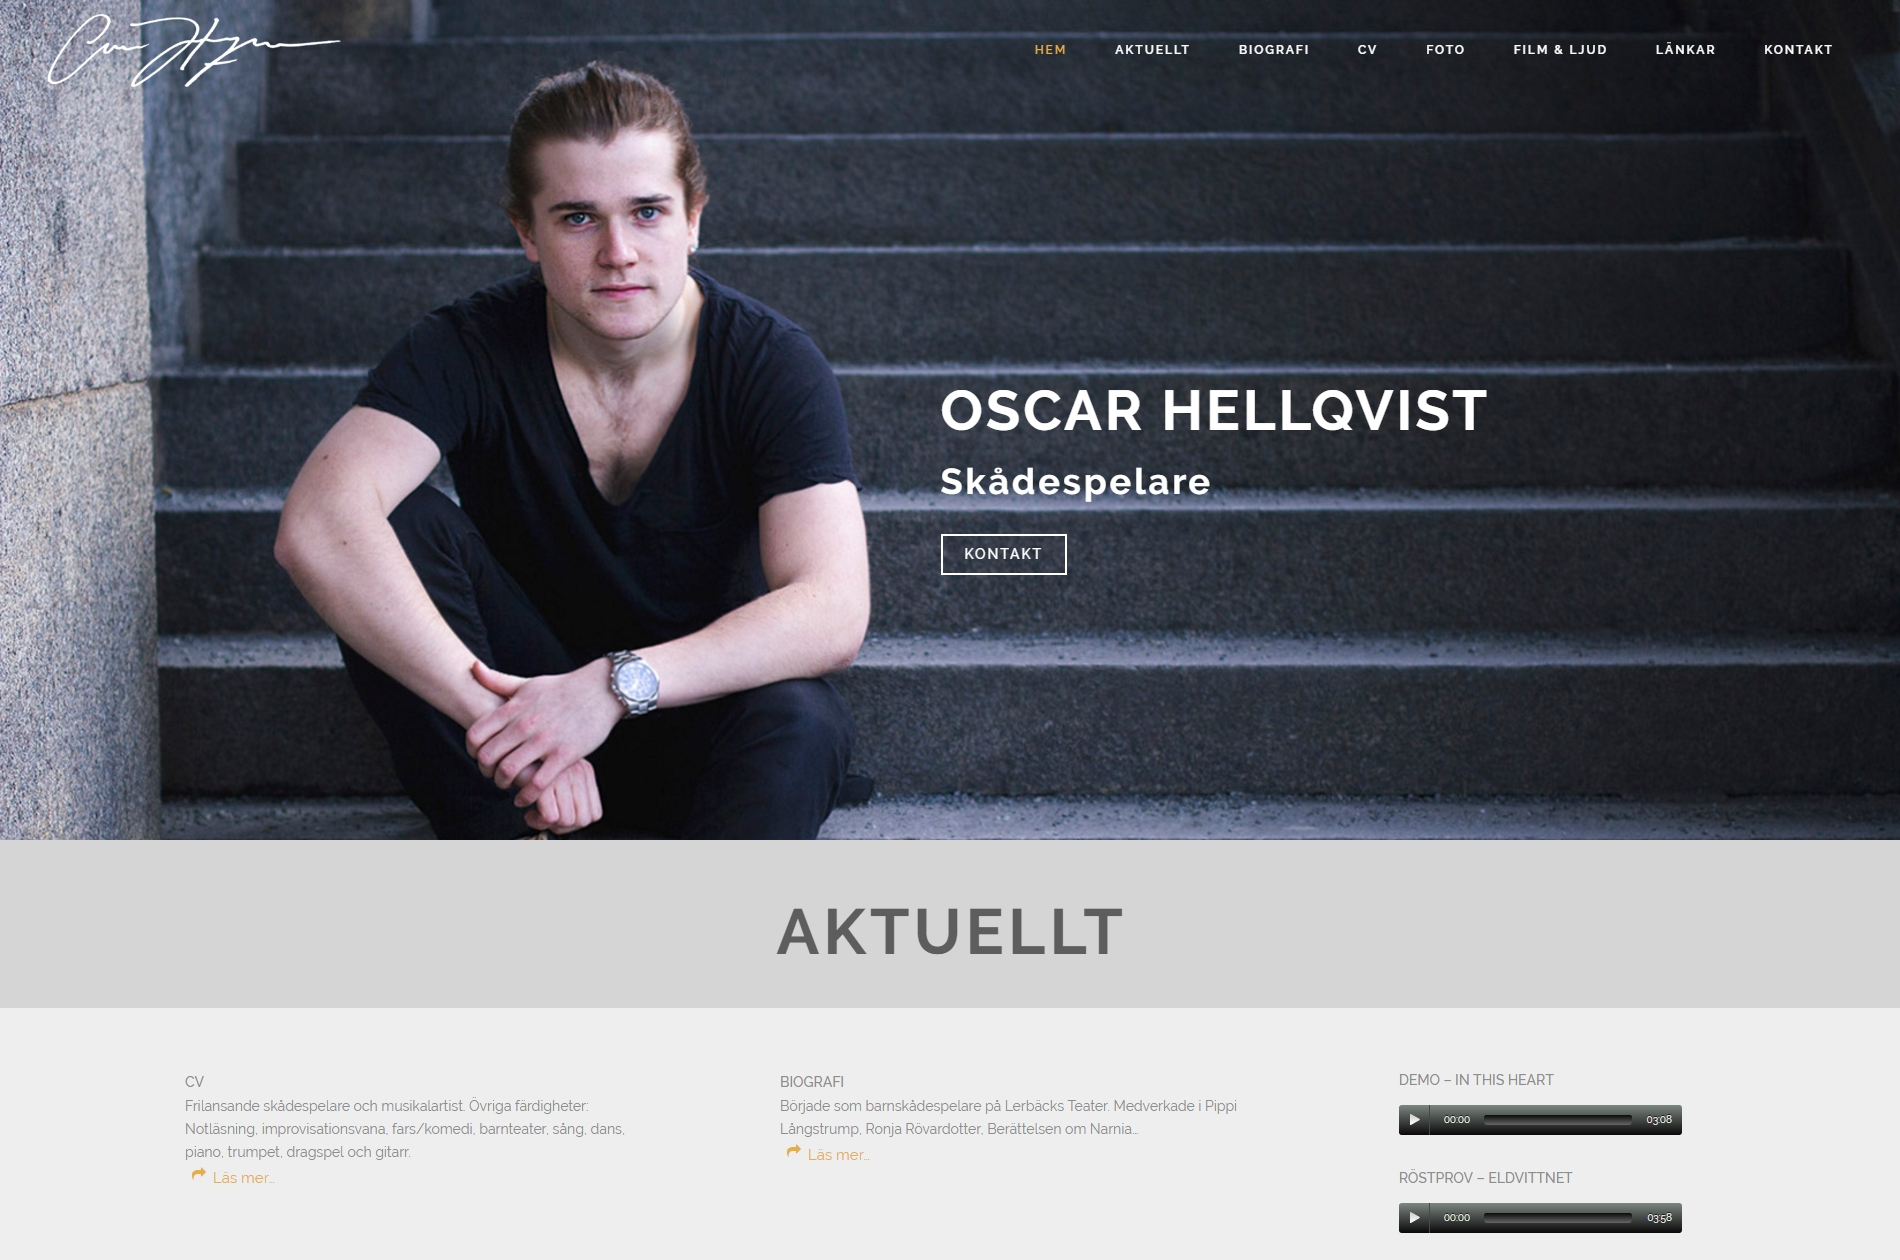 Web design responsive anweb Oscar Hellqvist Skådespelare